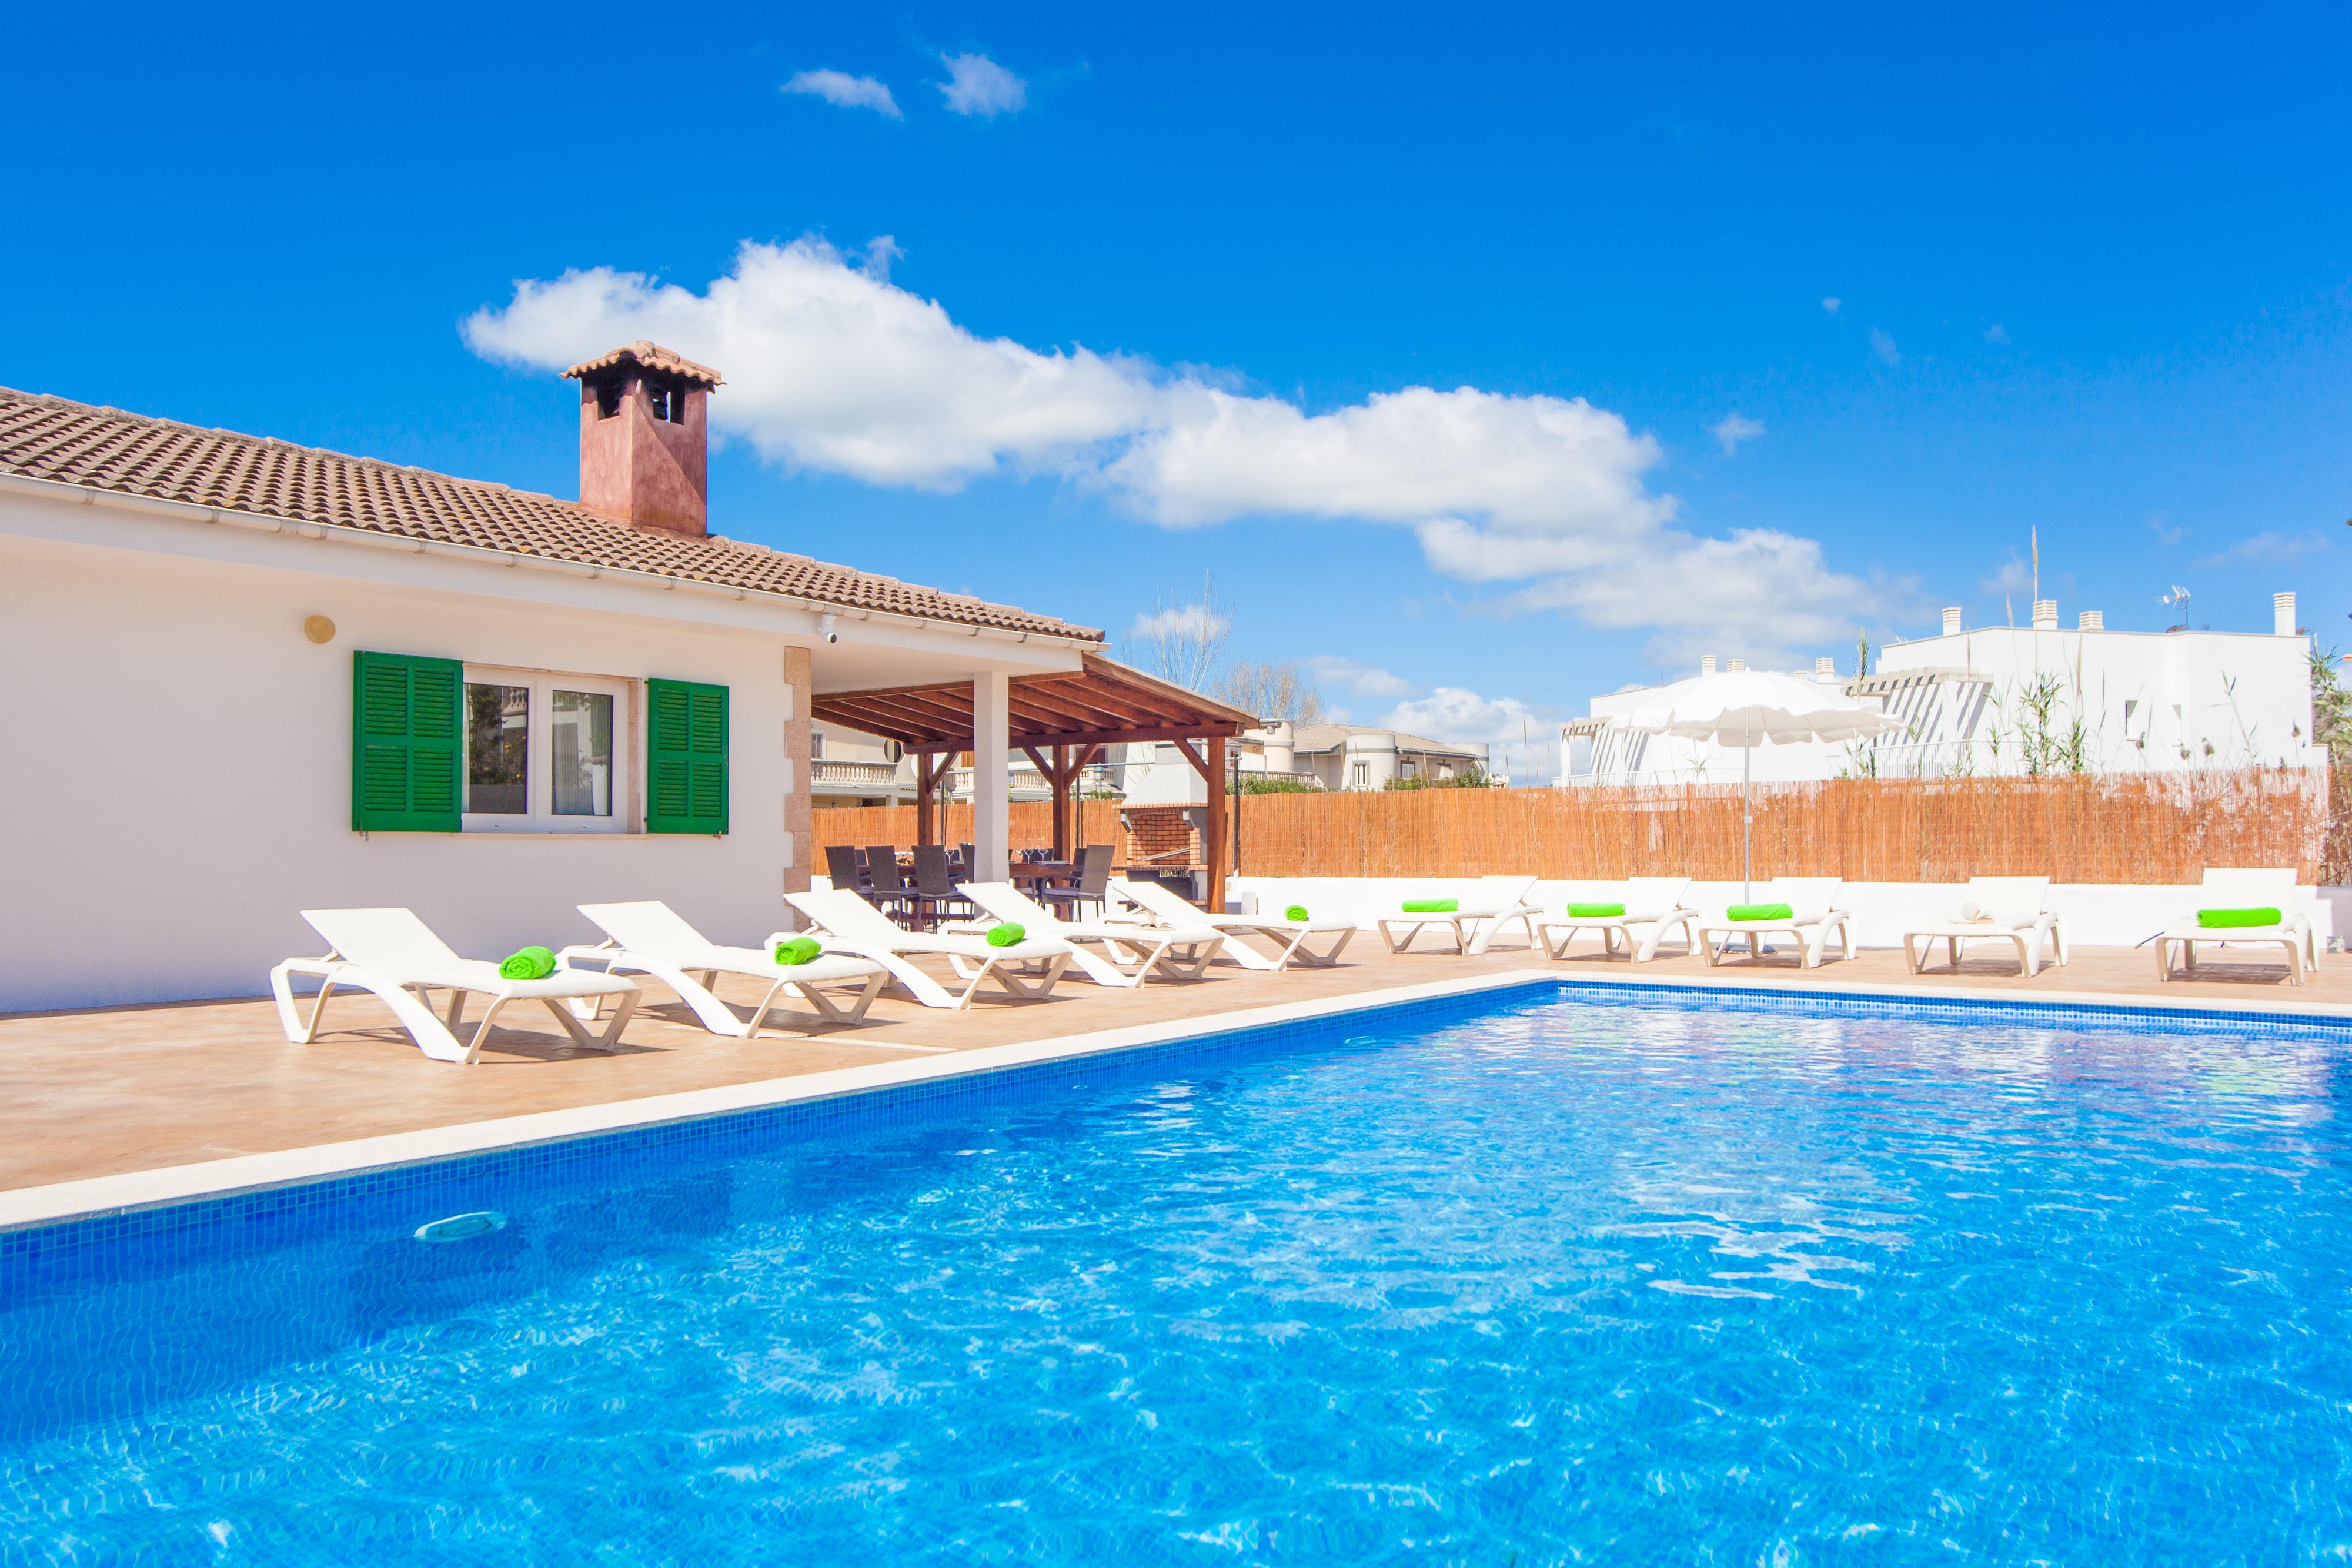 Ferienhaus RODRIGUEZ DE LA FUENTE 19 (SIN NOMBRE) (2144936), Platja de Muro, Mallorca, Balearische Inseln, Spanien, Bild 25